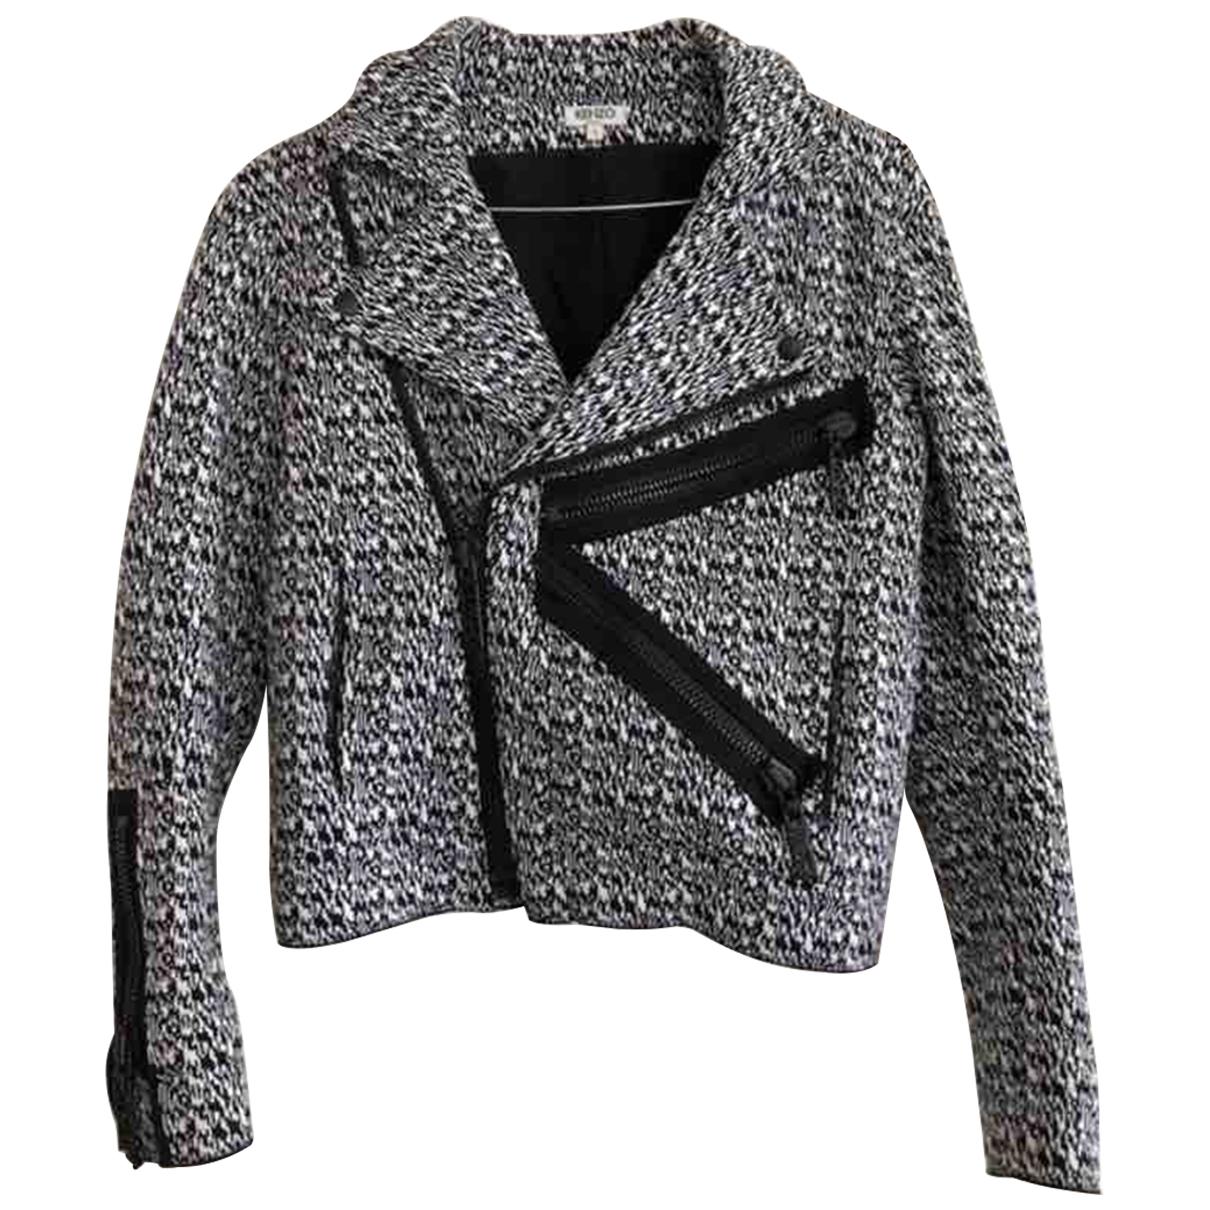 Kenzo \N Black jacket for Women 36 FR